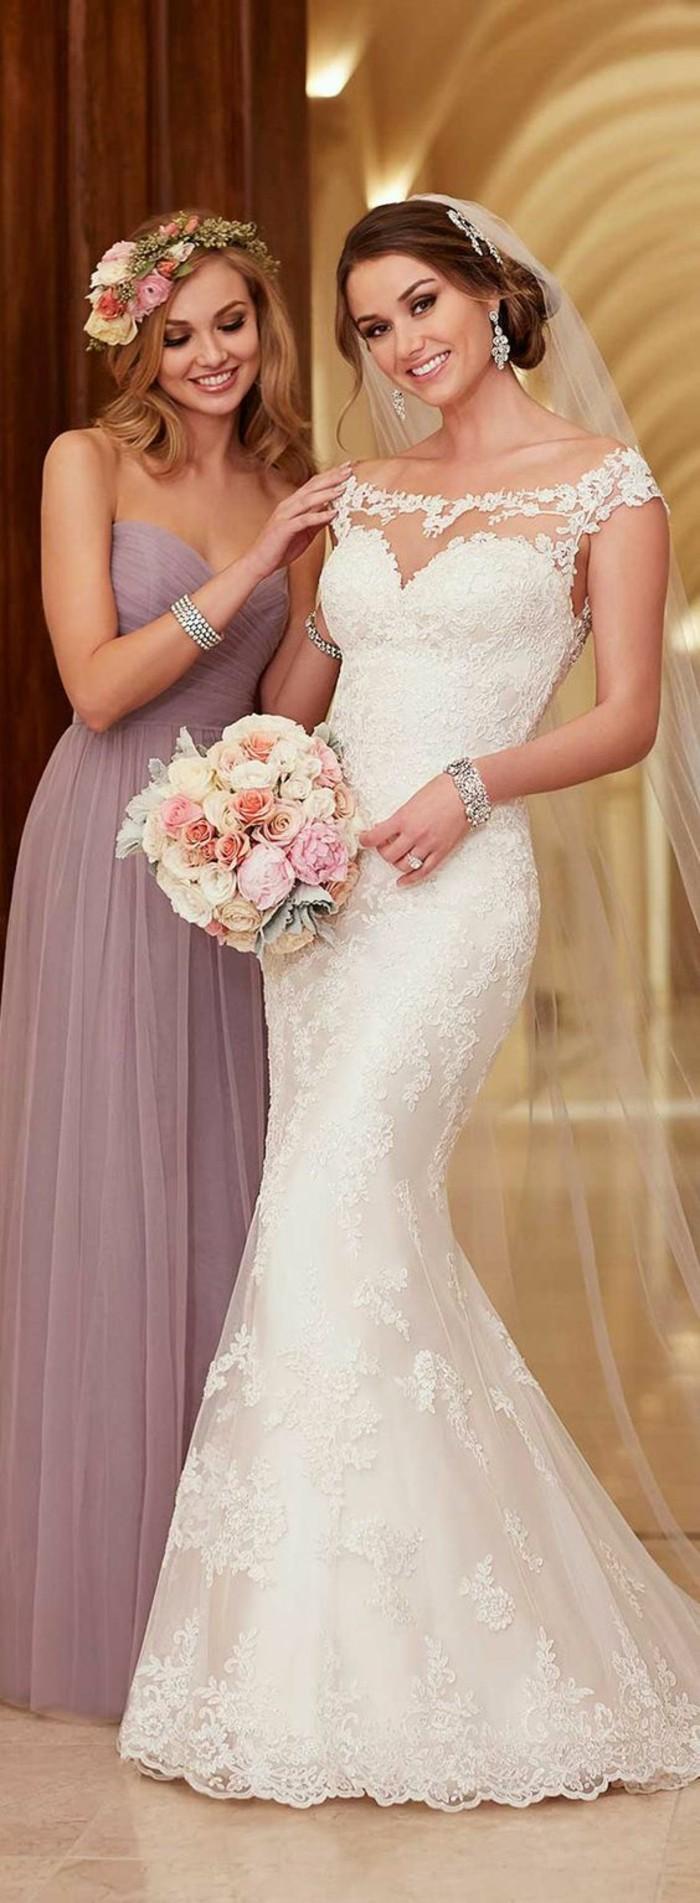 Chouette-robe-témoin-de-mariage-robe-pour-témoin-de-mariage-rose-poudrée